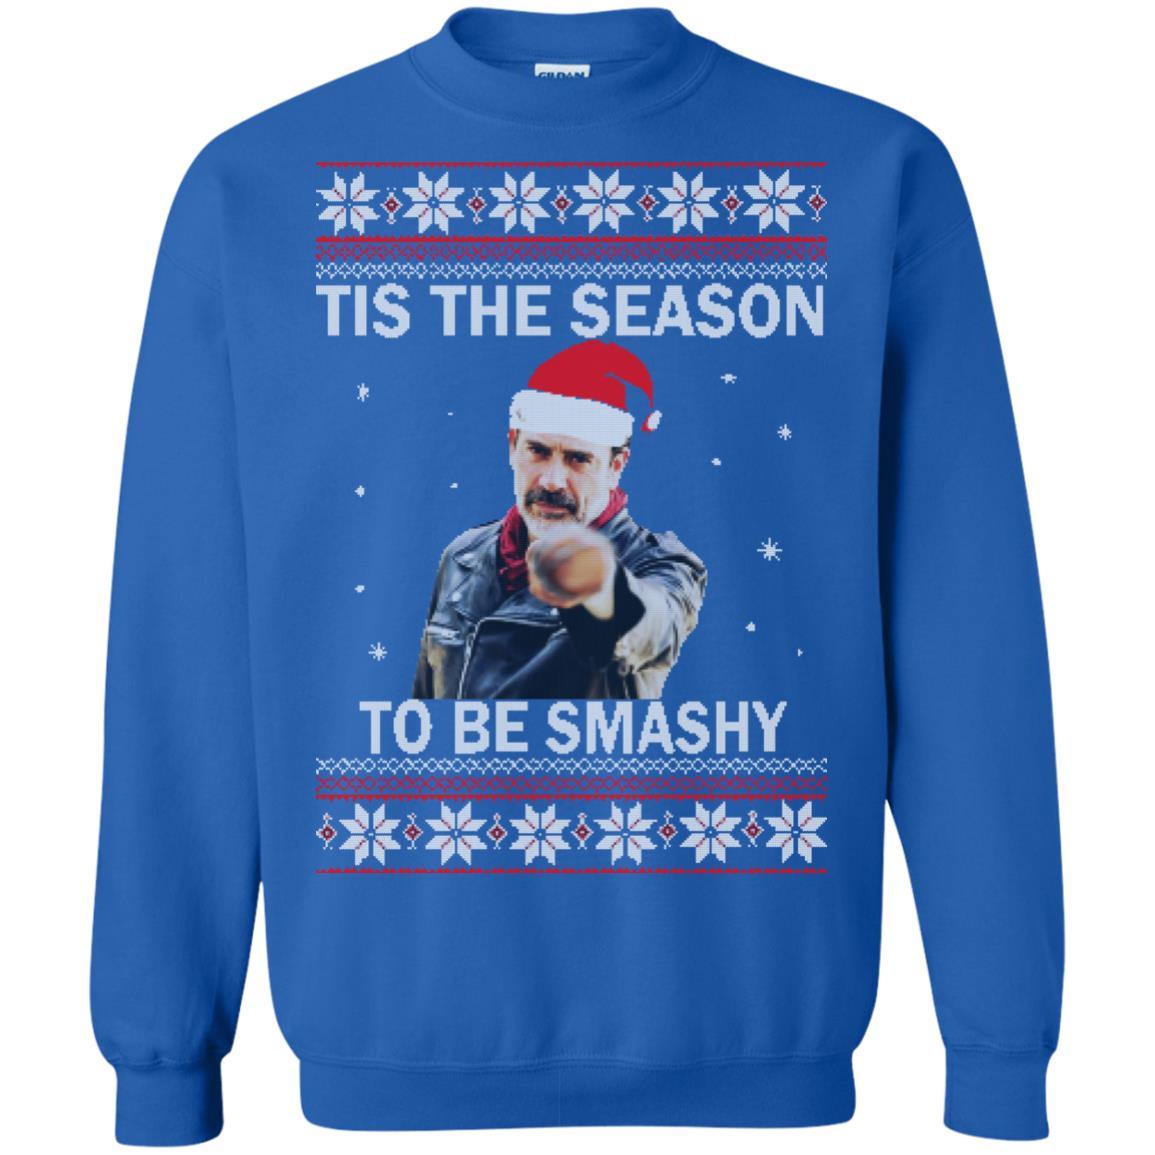 Walking Dead Christmas Sweater.Negan Tis The Season To Be Smashy Christmas Sweater Shirt